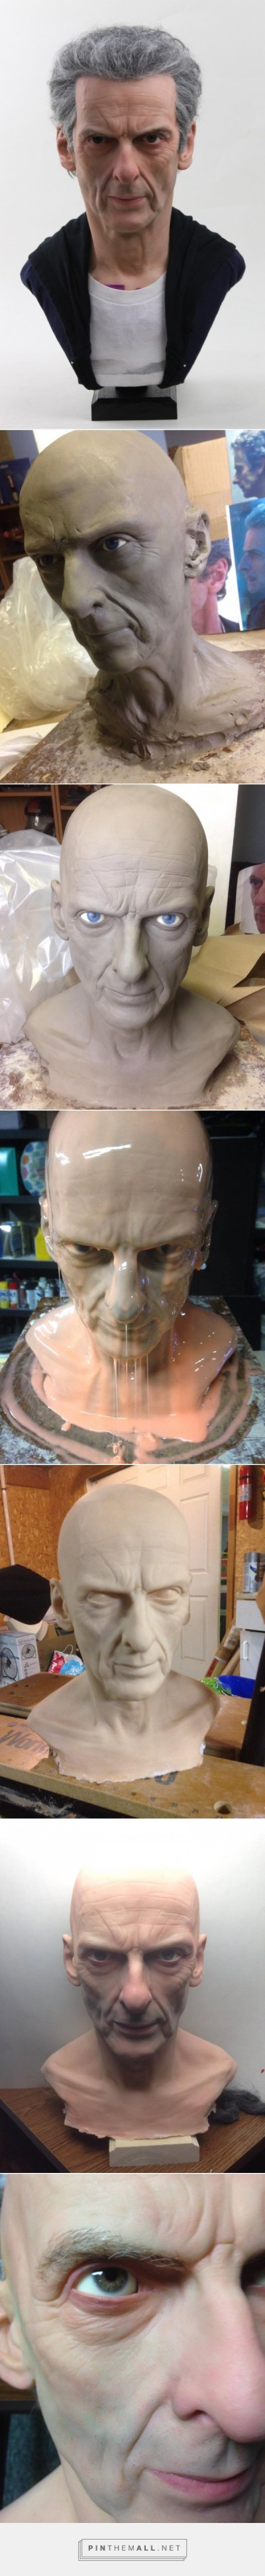 Technique sculpture hyper realiste – 12th Doctor (Peter Capaldi) Life-Sized Sculpture by mrstevenrichter –  http://imgur.com/gallery/31NDo